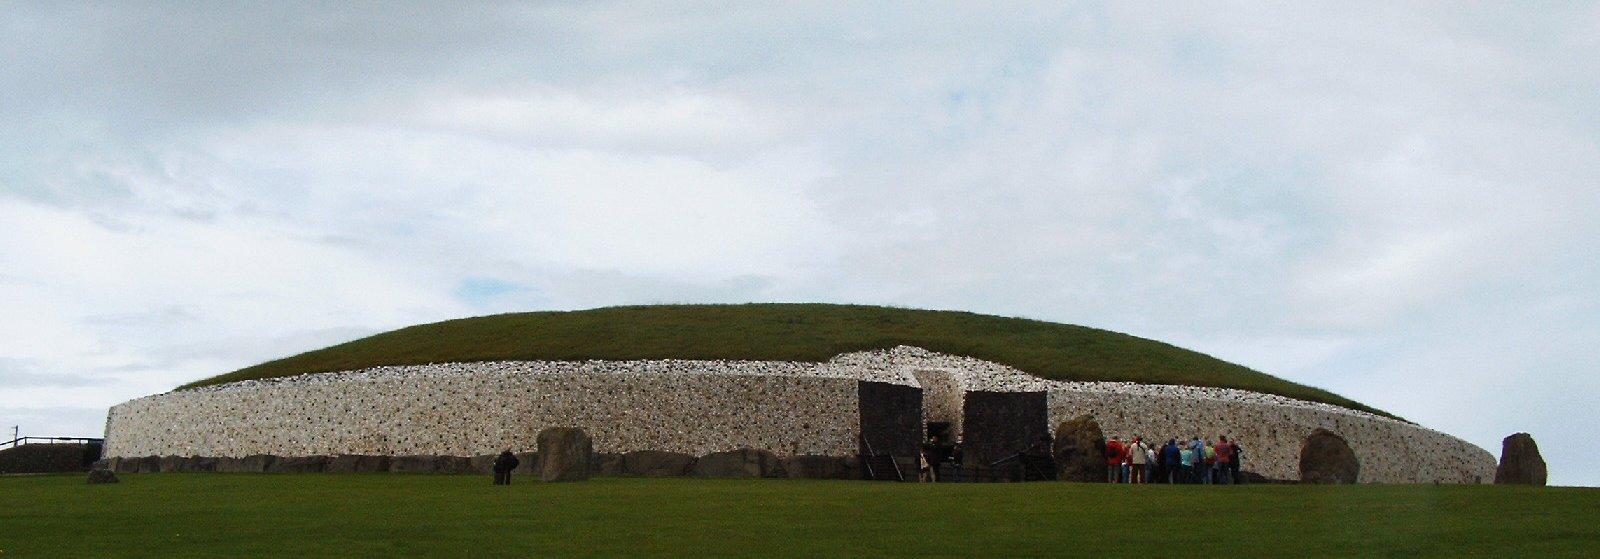 Newgrange Ireland Tomb Entrance